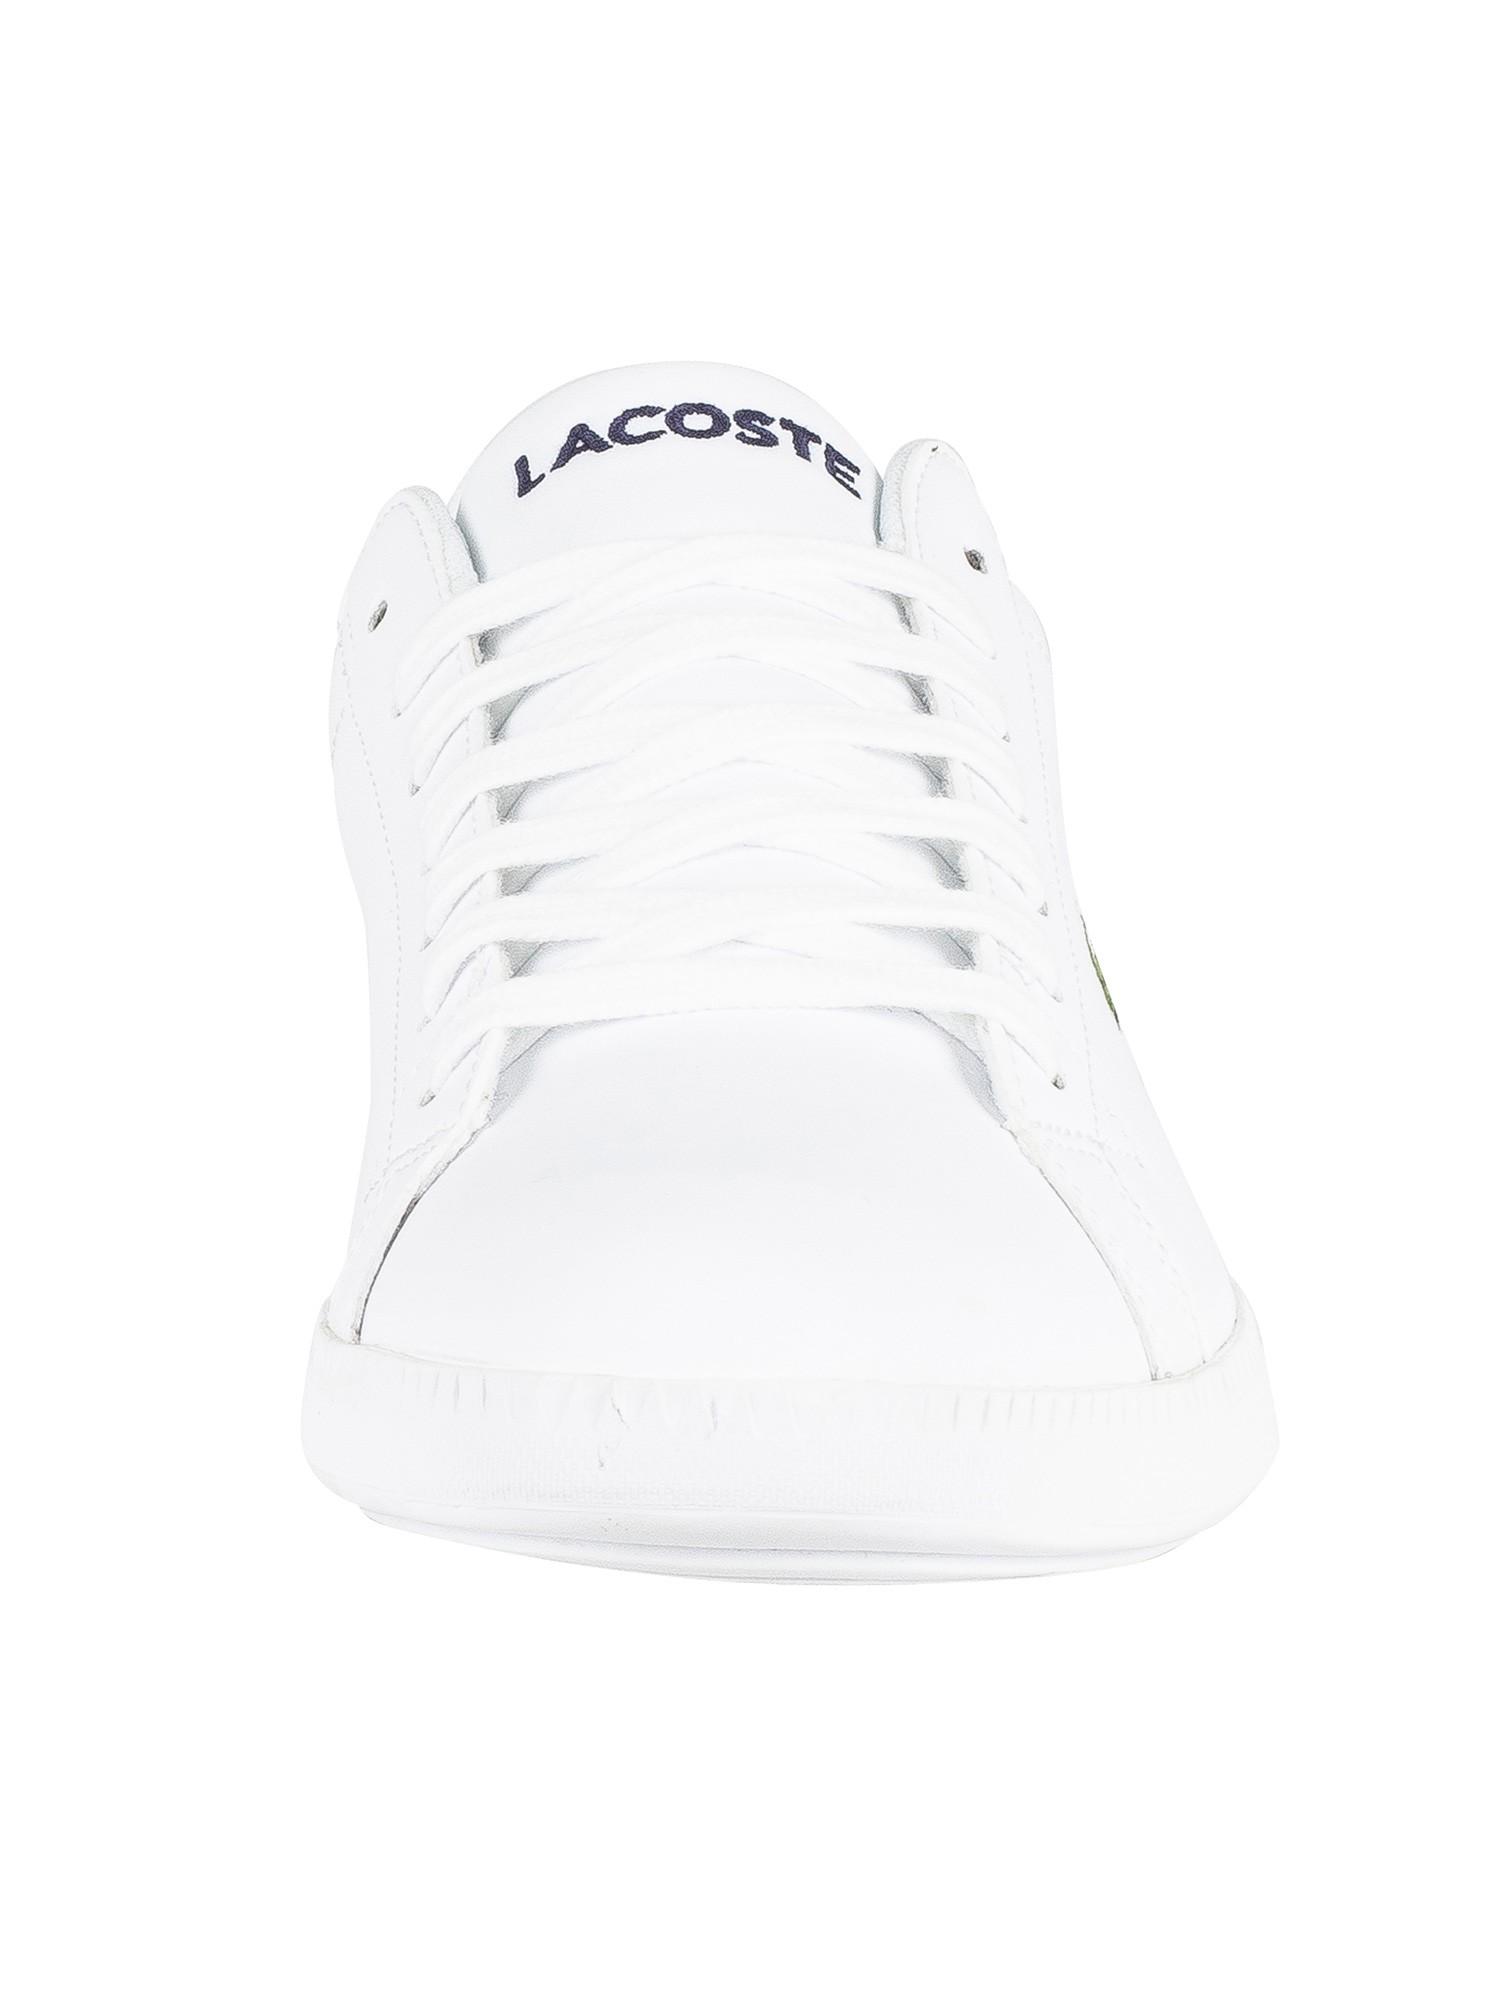 Lacoste Men/'s Graduate BL 1 Leather Trainers White